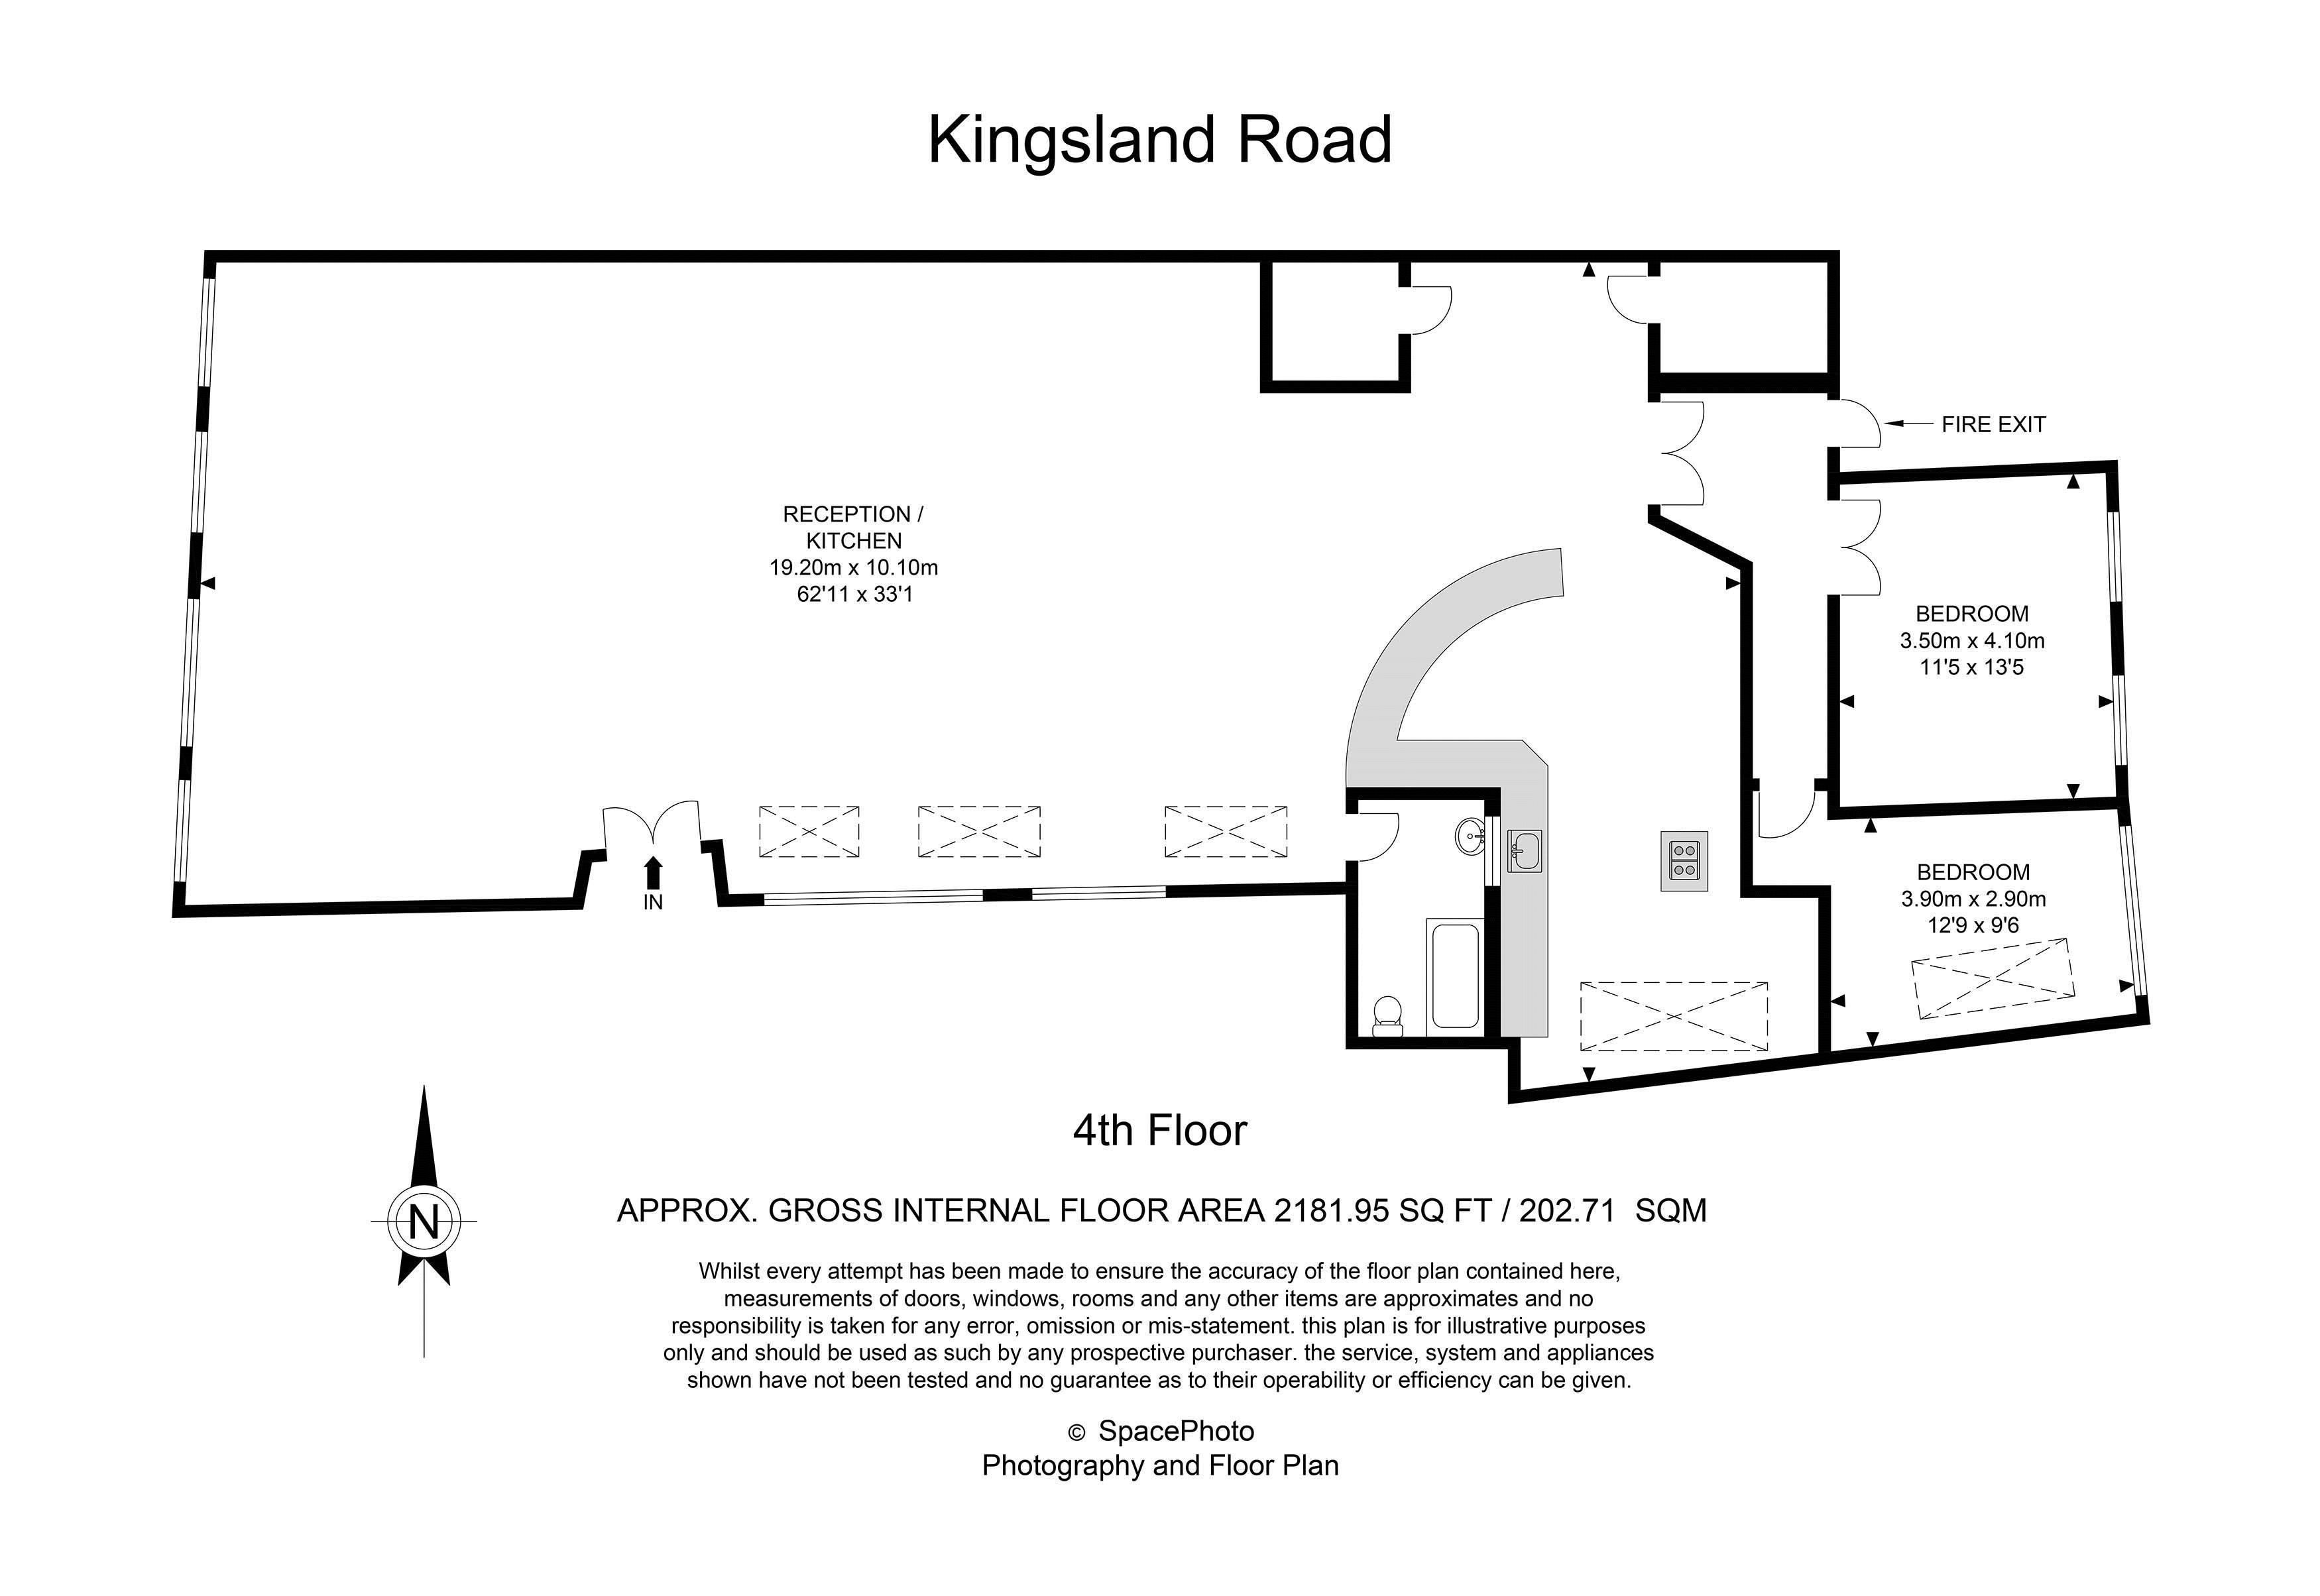 Kingsland Rd